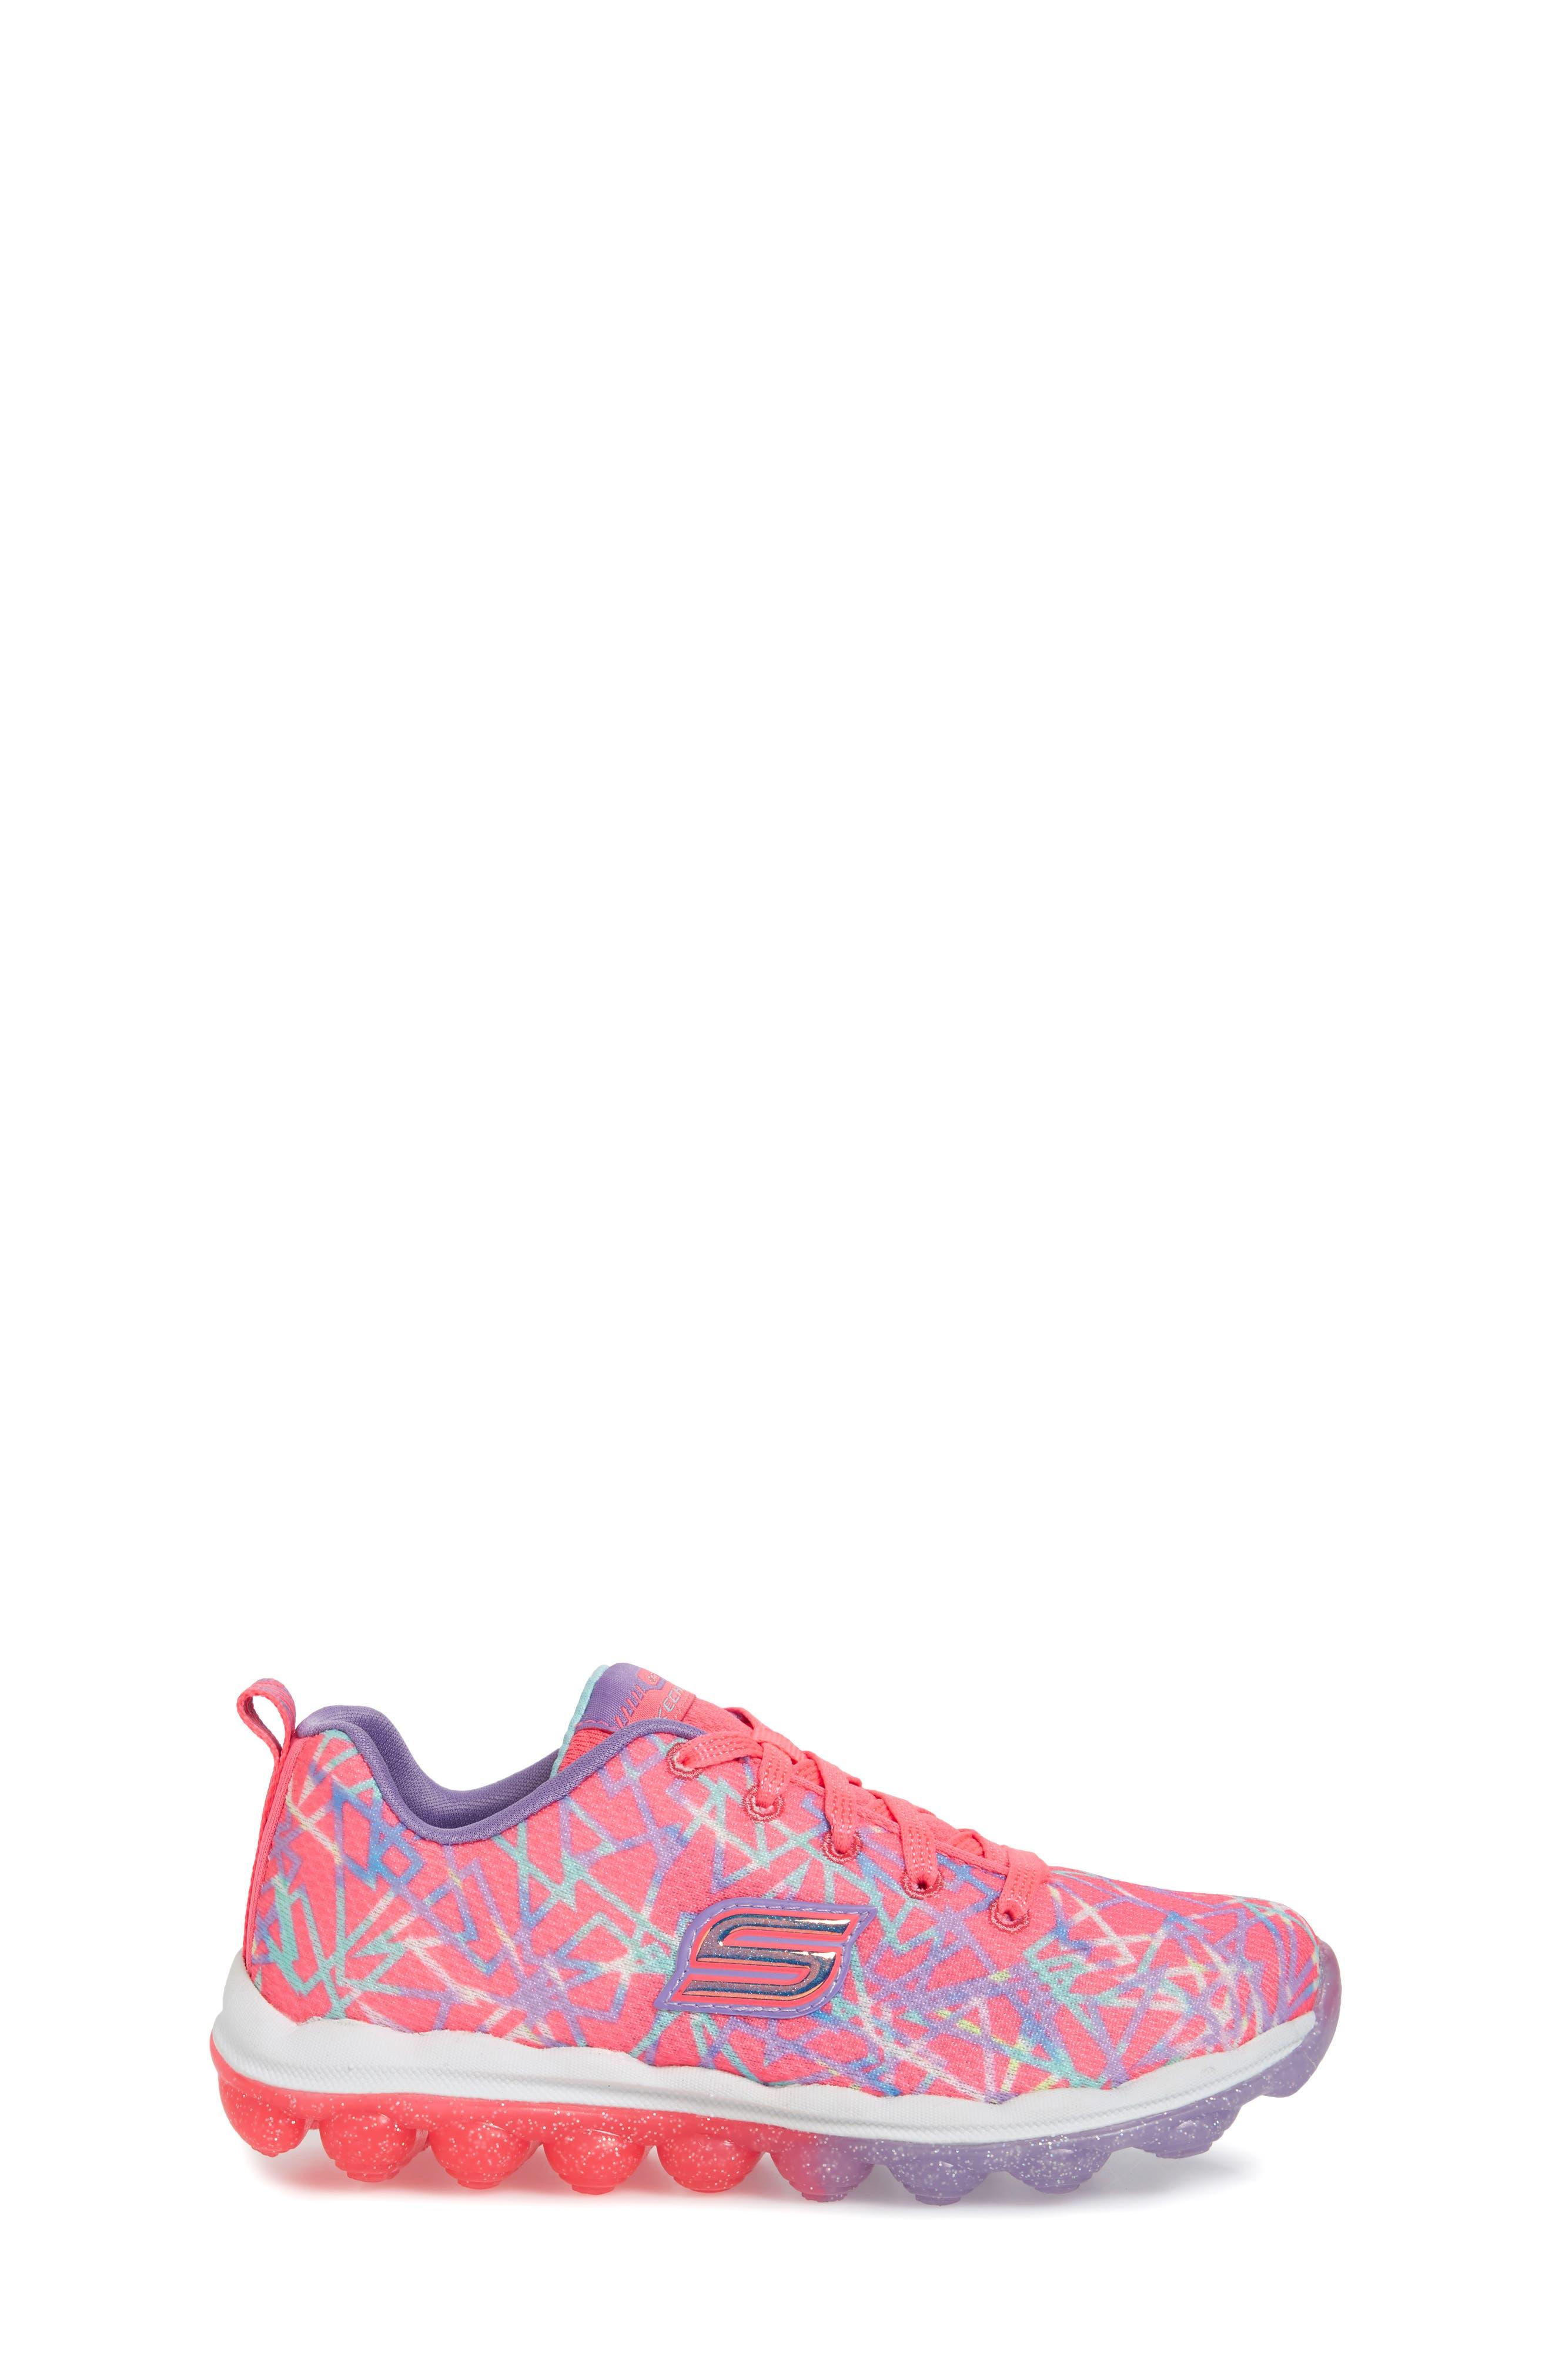 Skech-Air Sneaker,                             Alternate thumbnail 3, color,                             650